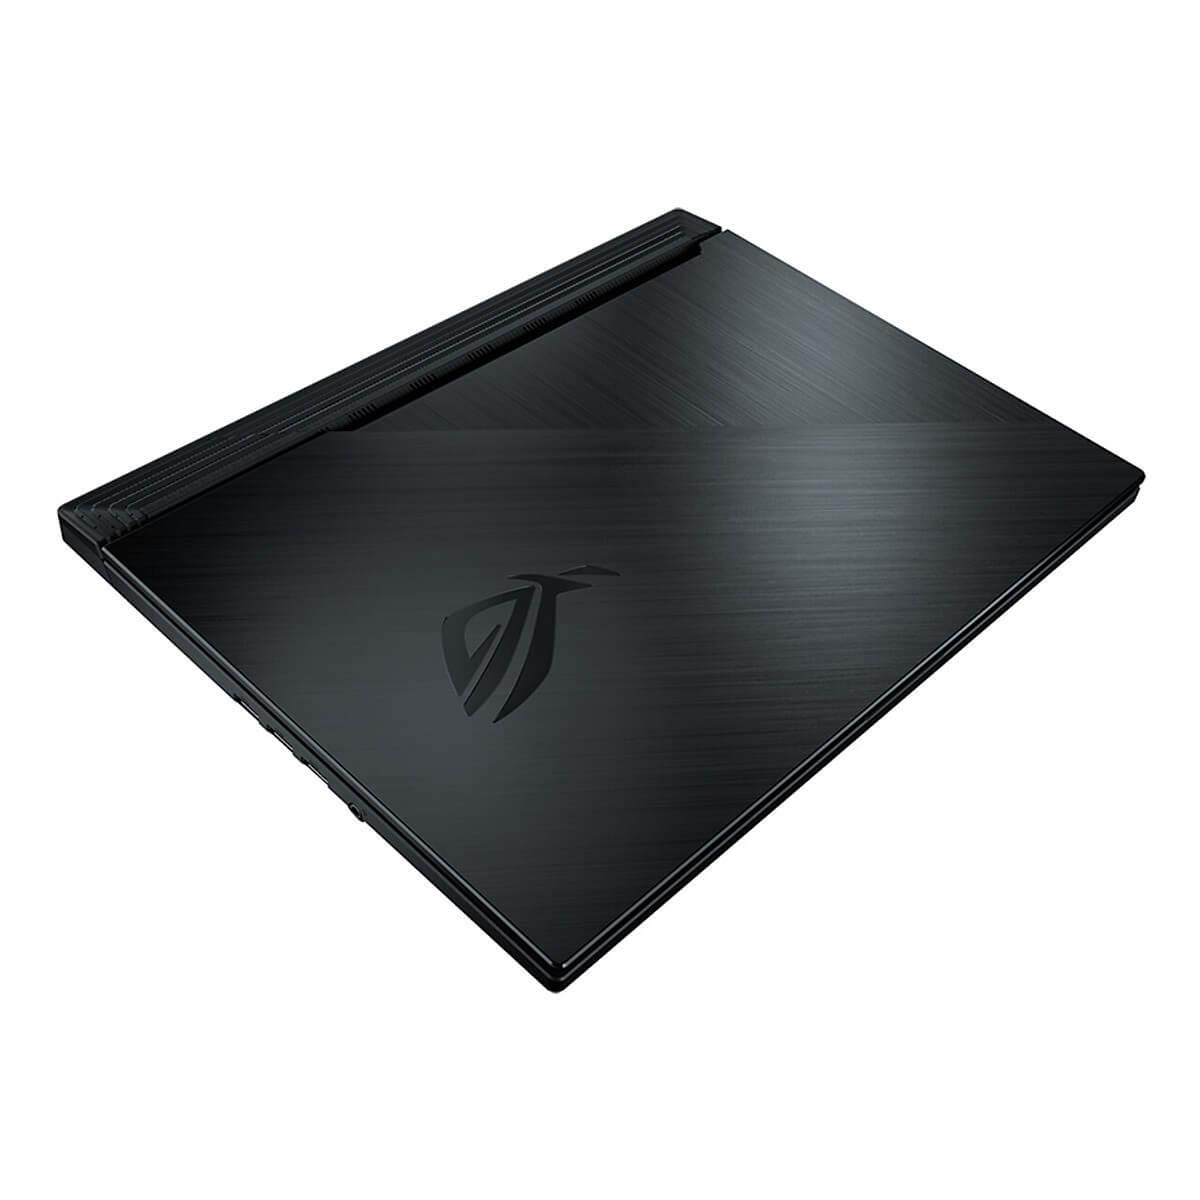 Laptop Asus ROG Strix G G531GD-AL025T Core i5-9300H, Ram 8GB, SSD 512GB,15.6 FHD IPS